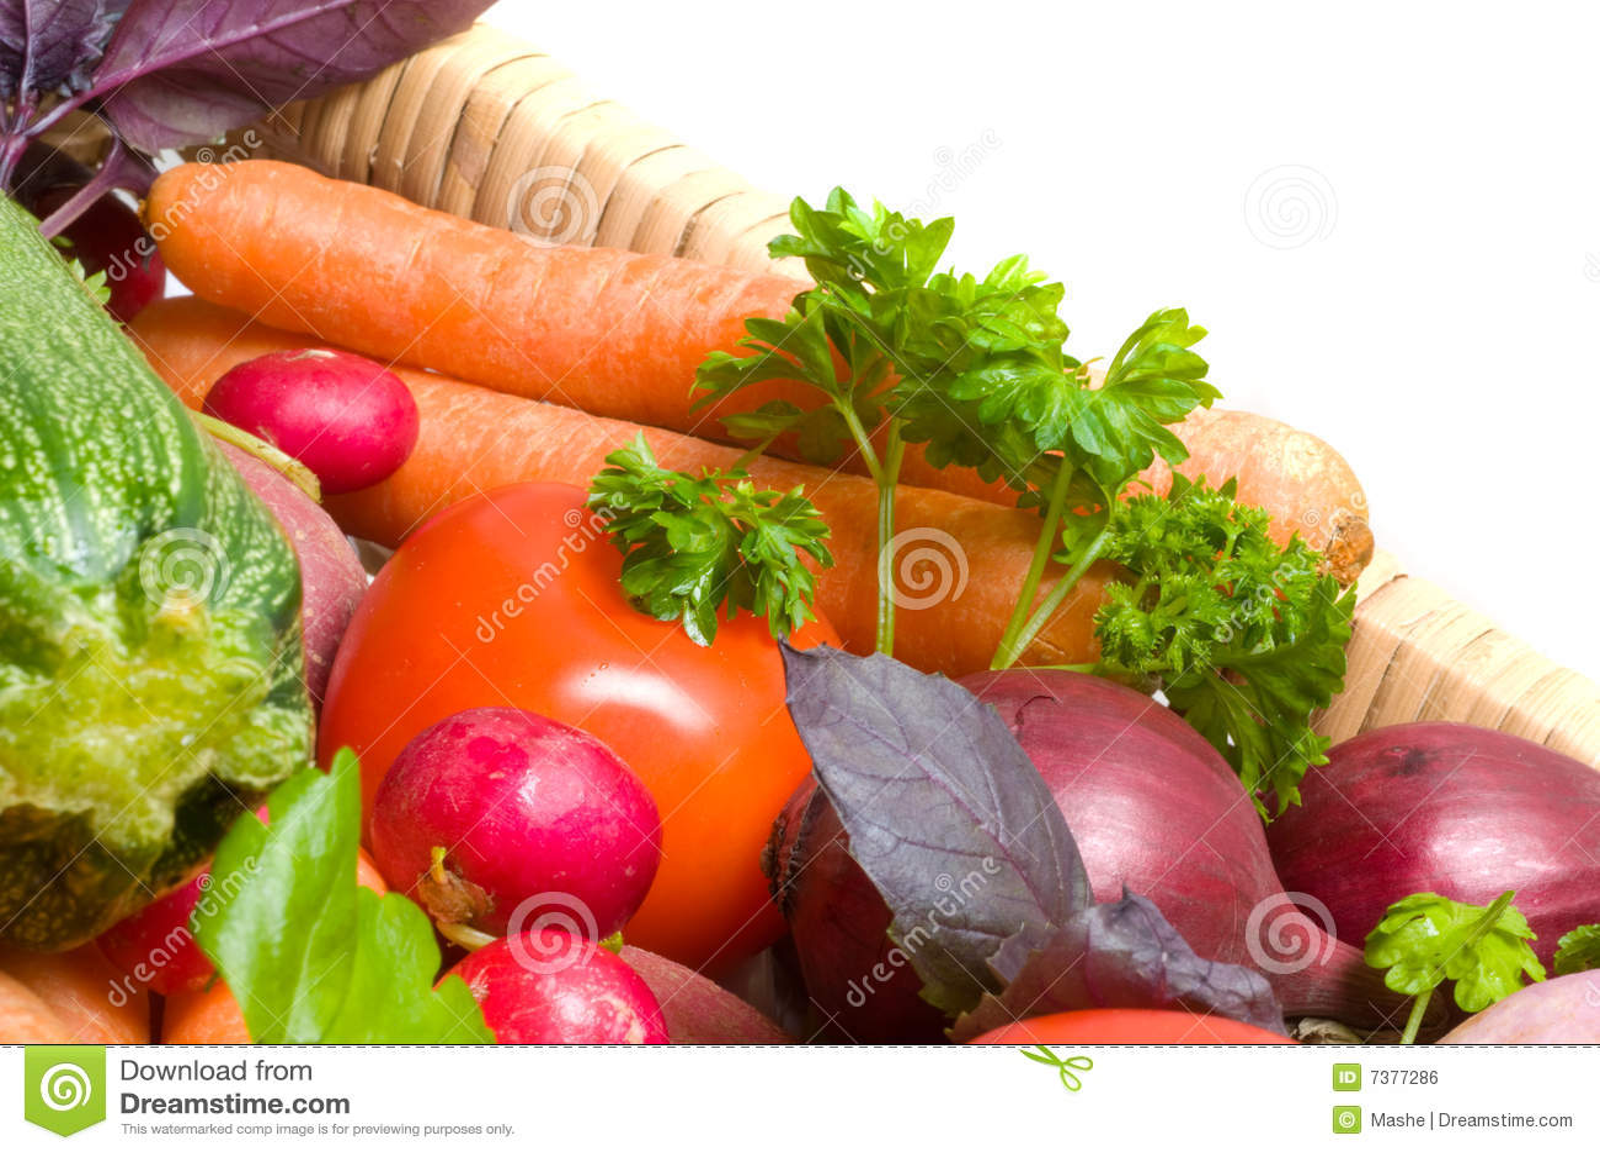 Fresh beautiful vegetables royalty free stock image for Beautiful vegetables